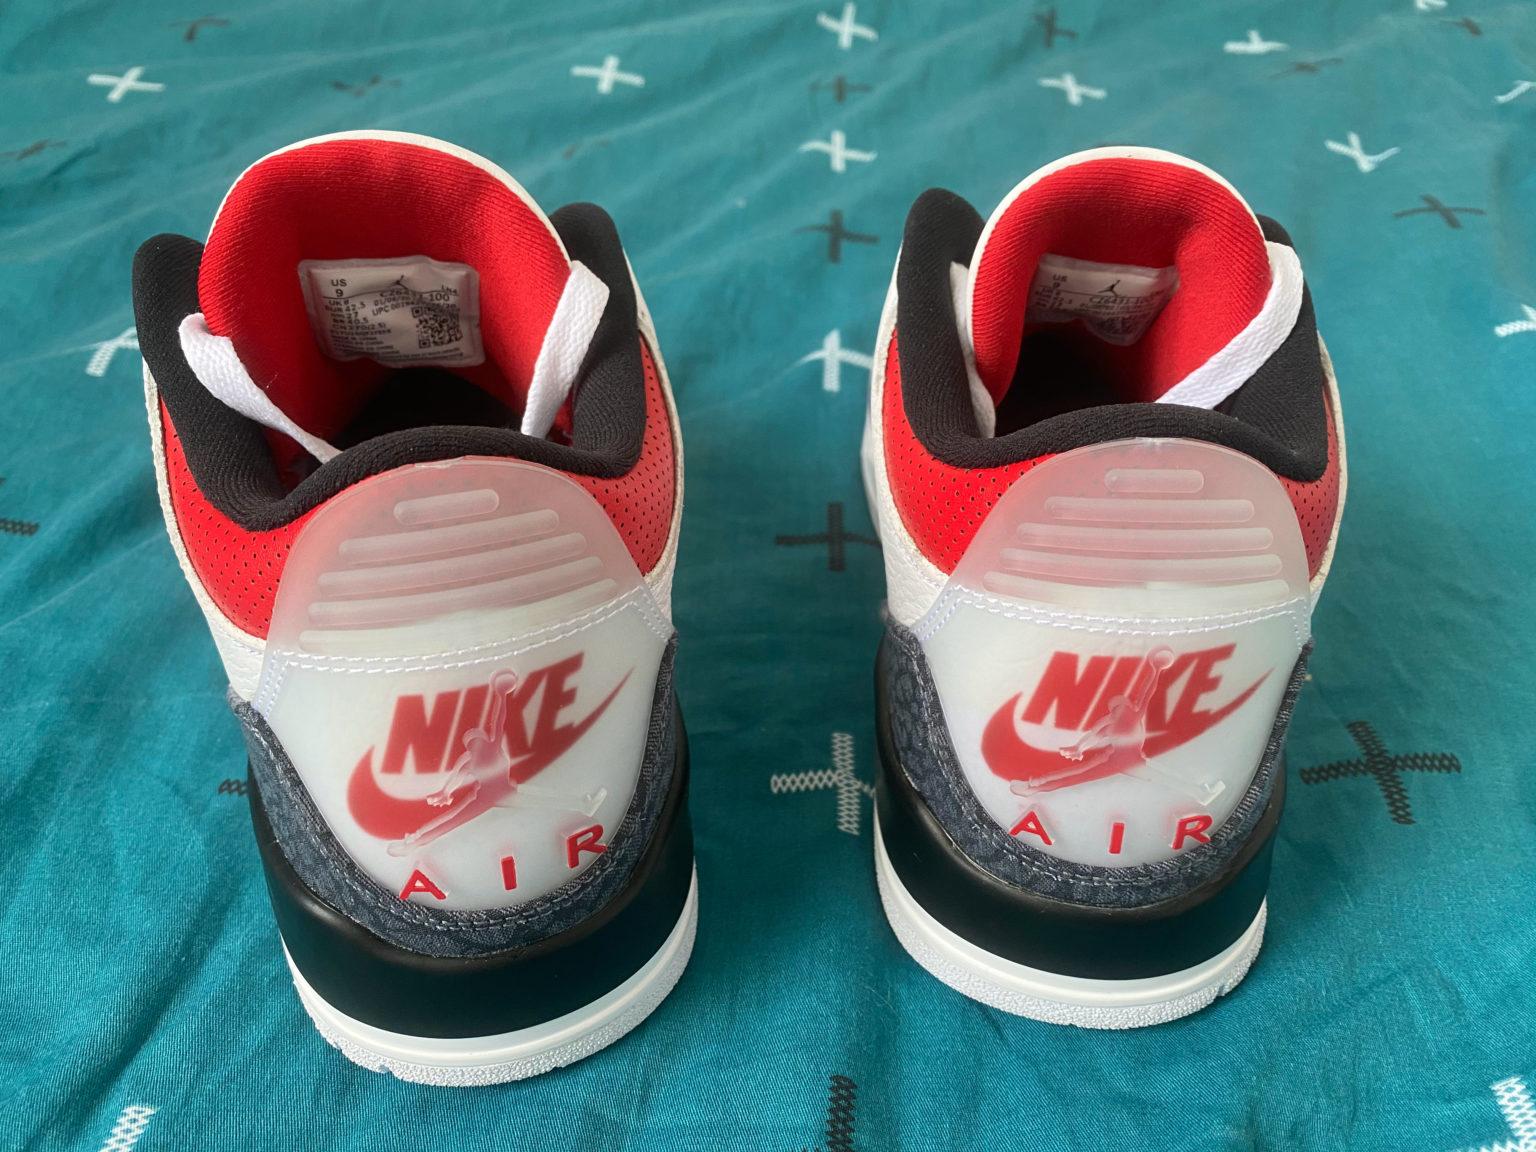 Air Jordan 3 SE Denim Fire Red CZ6431-100 Release Details